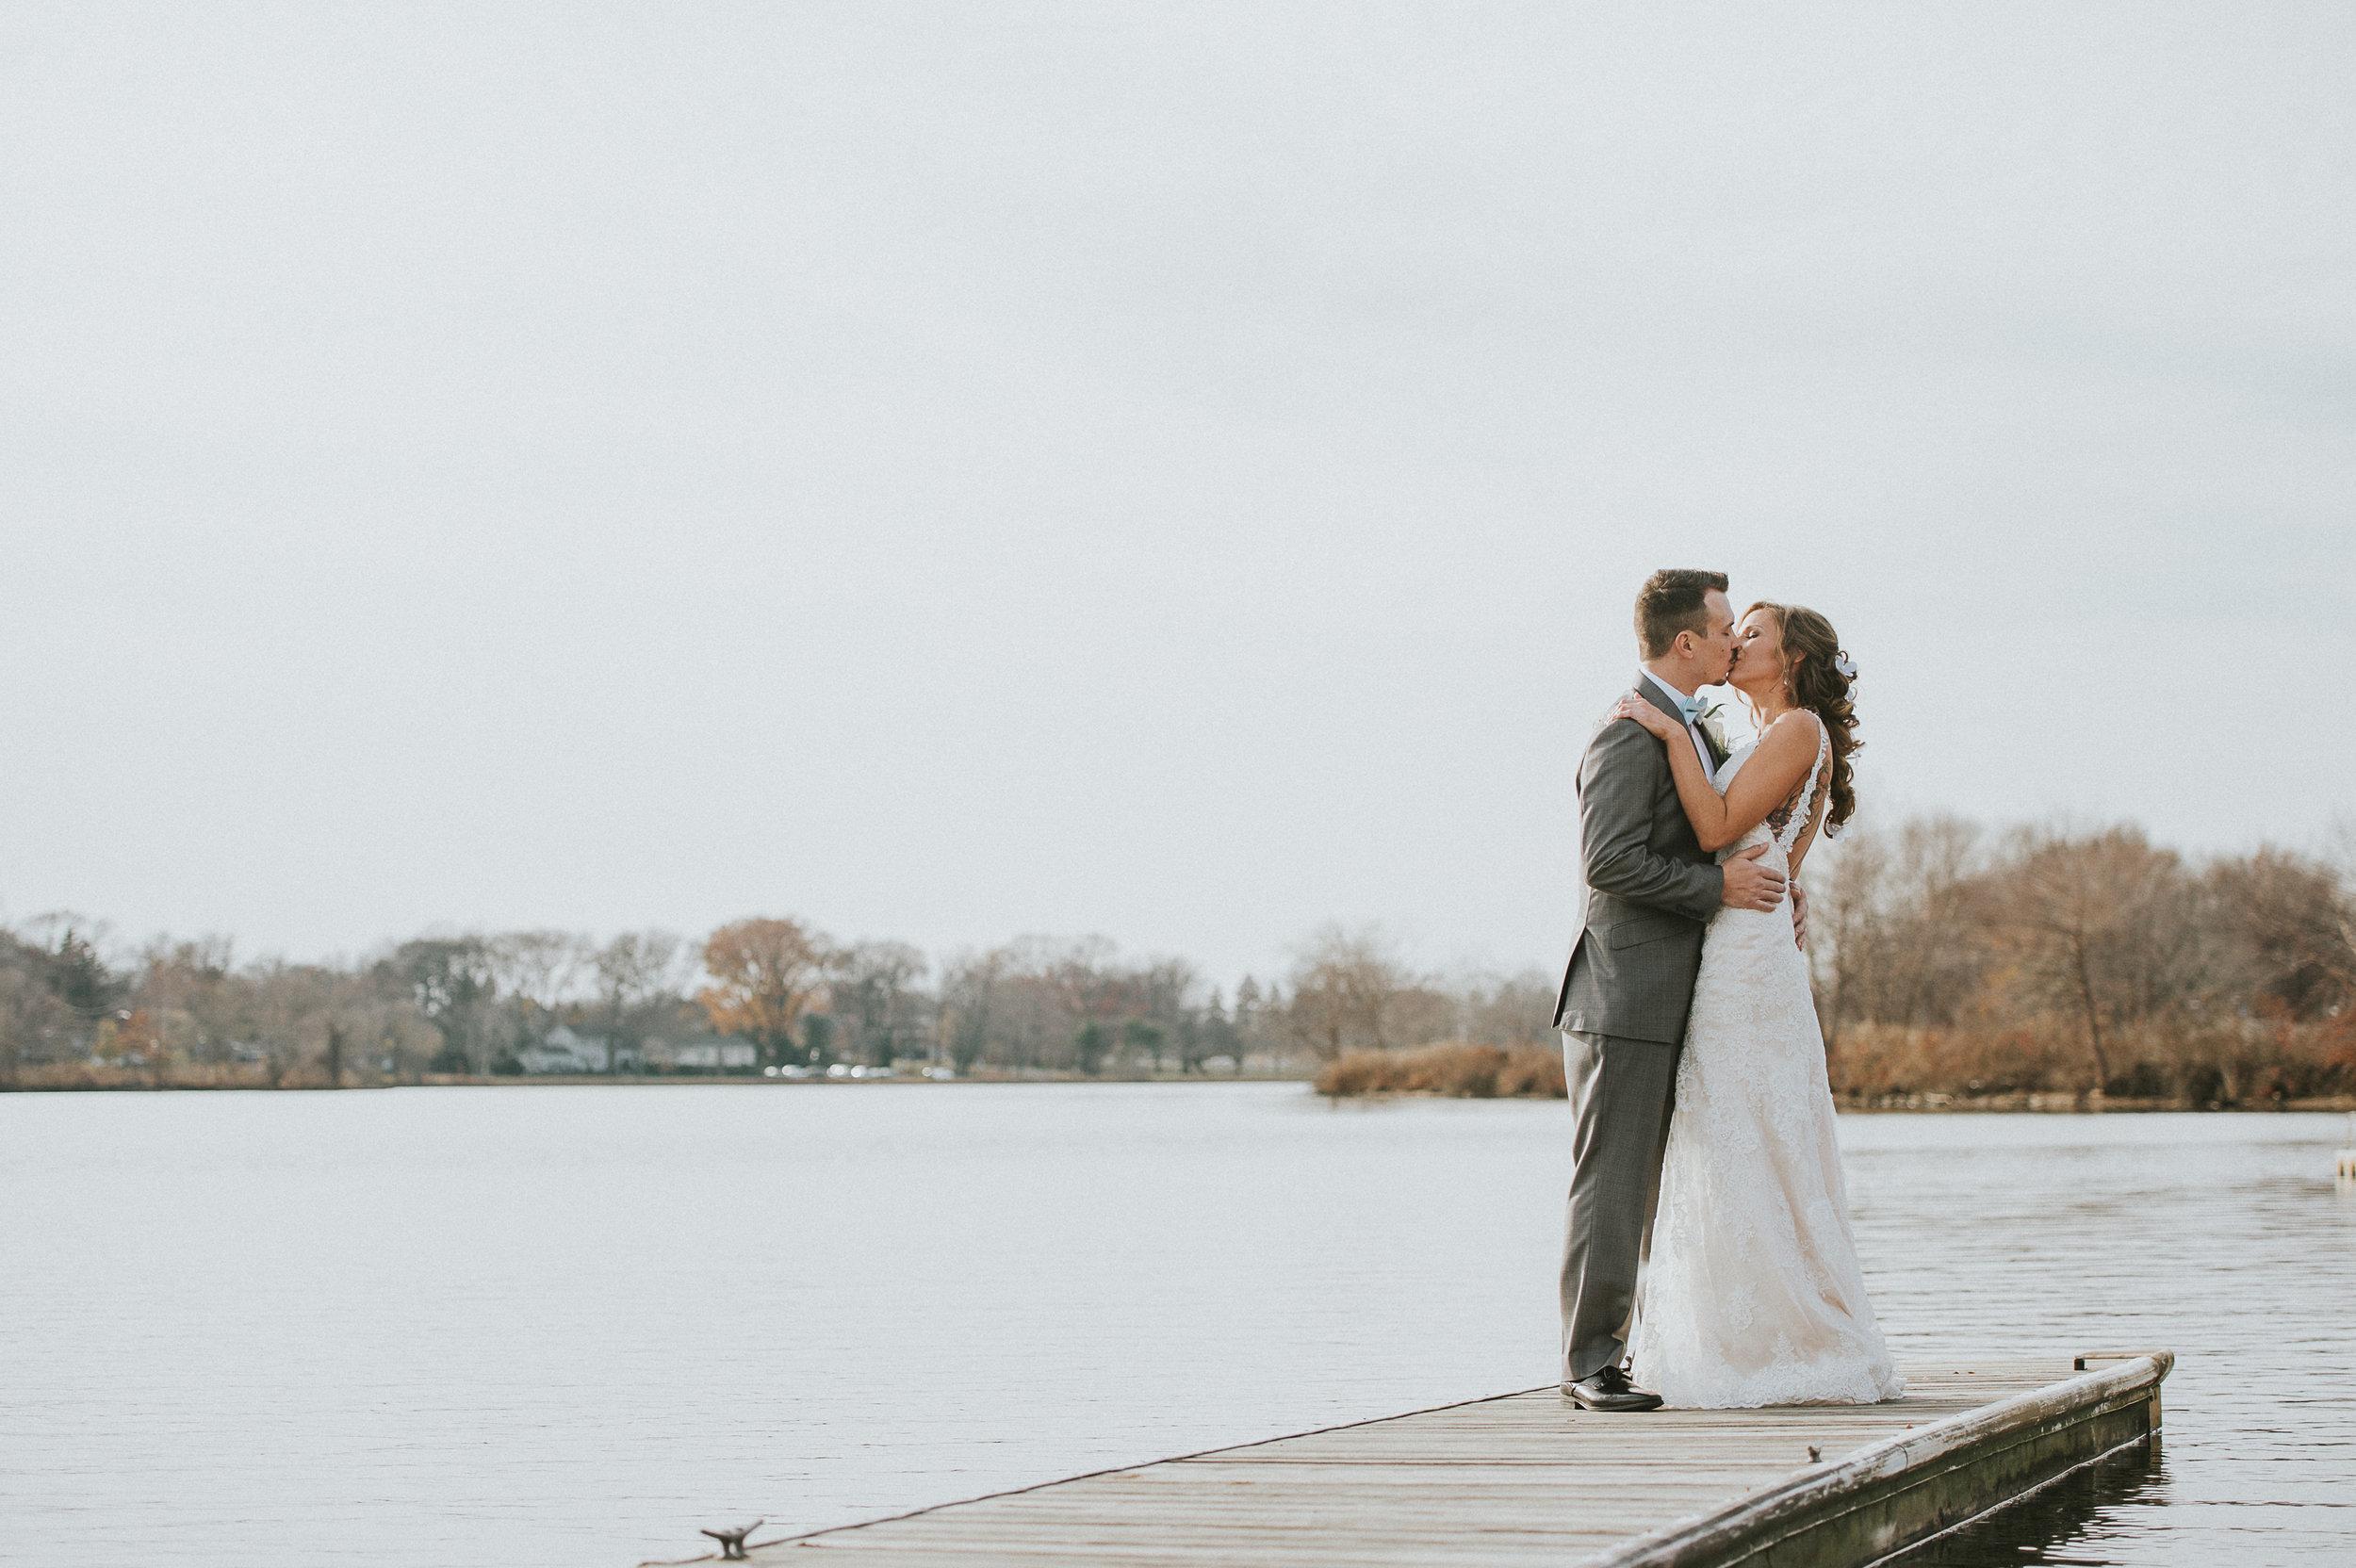 Camden-Boat-House-Wedding-Ali-and-Lance-111.jpg